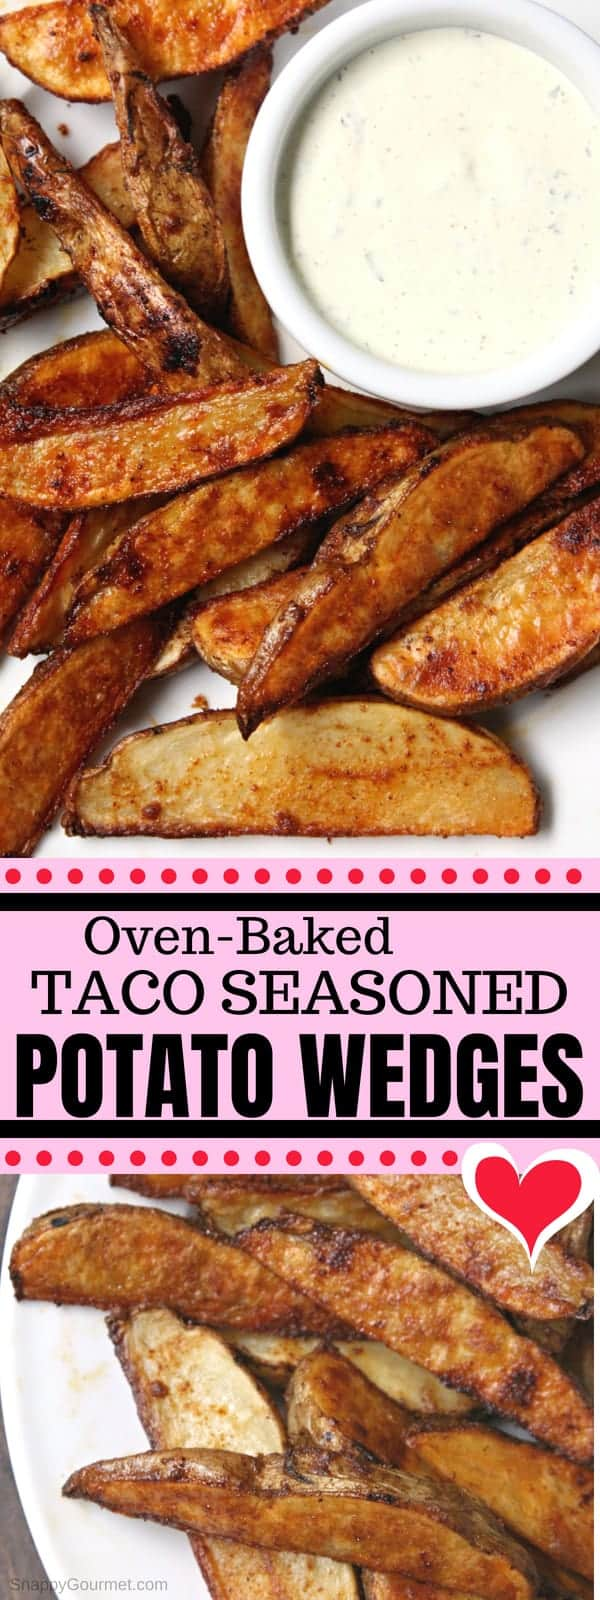 Oven Baked Potato Wedges - easy homemade potato wedges recipe with taco seasoning